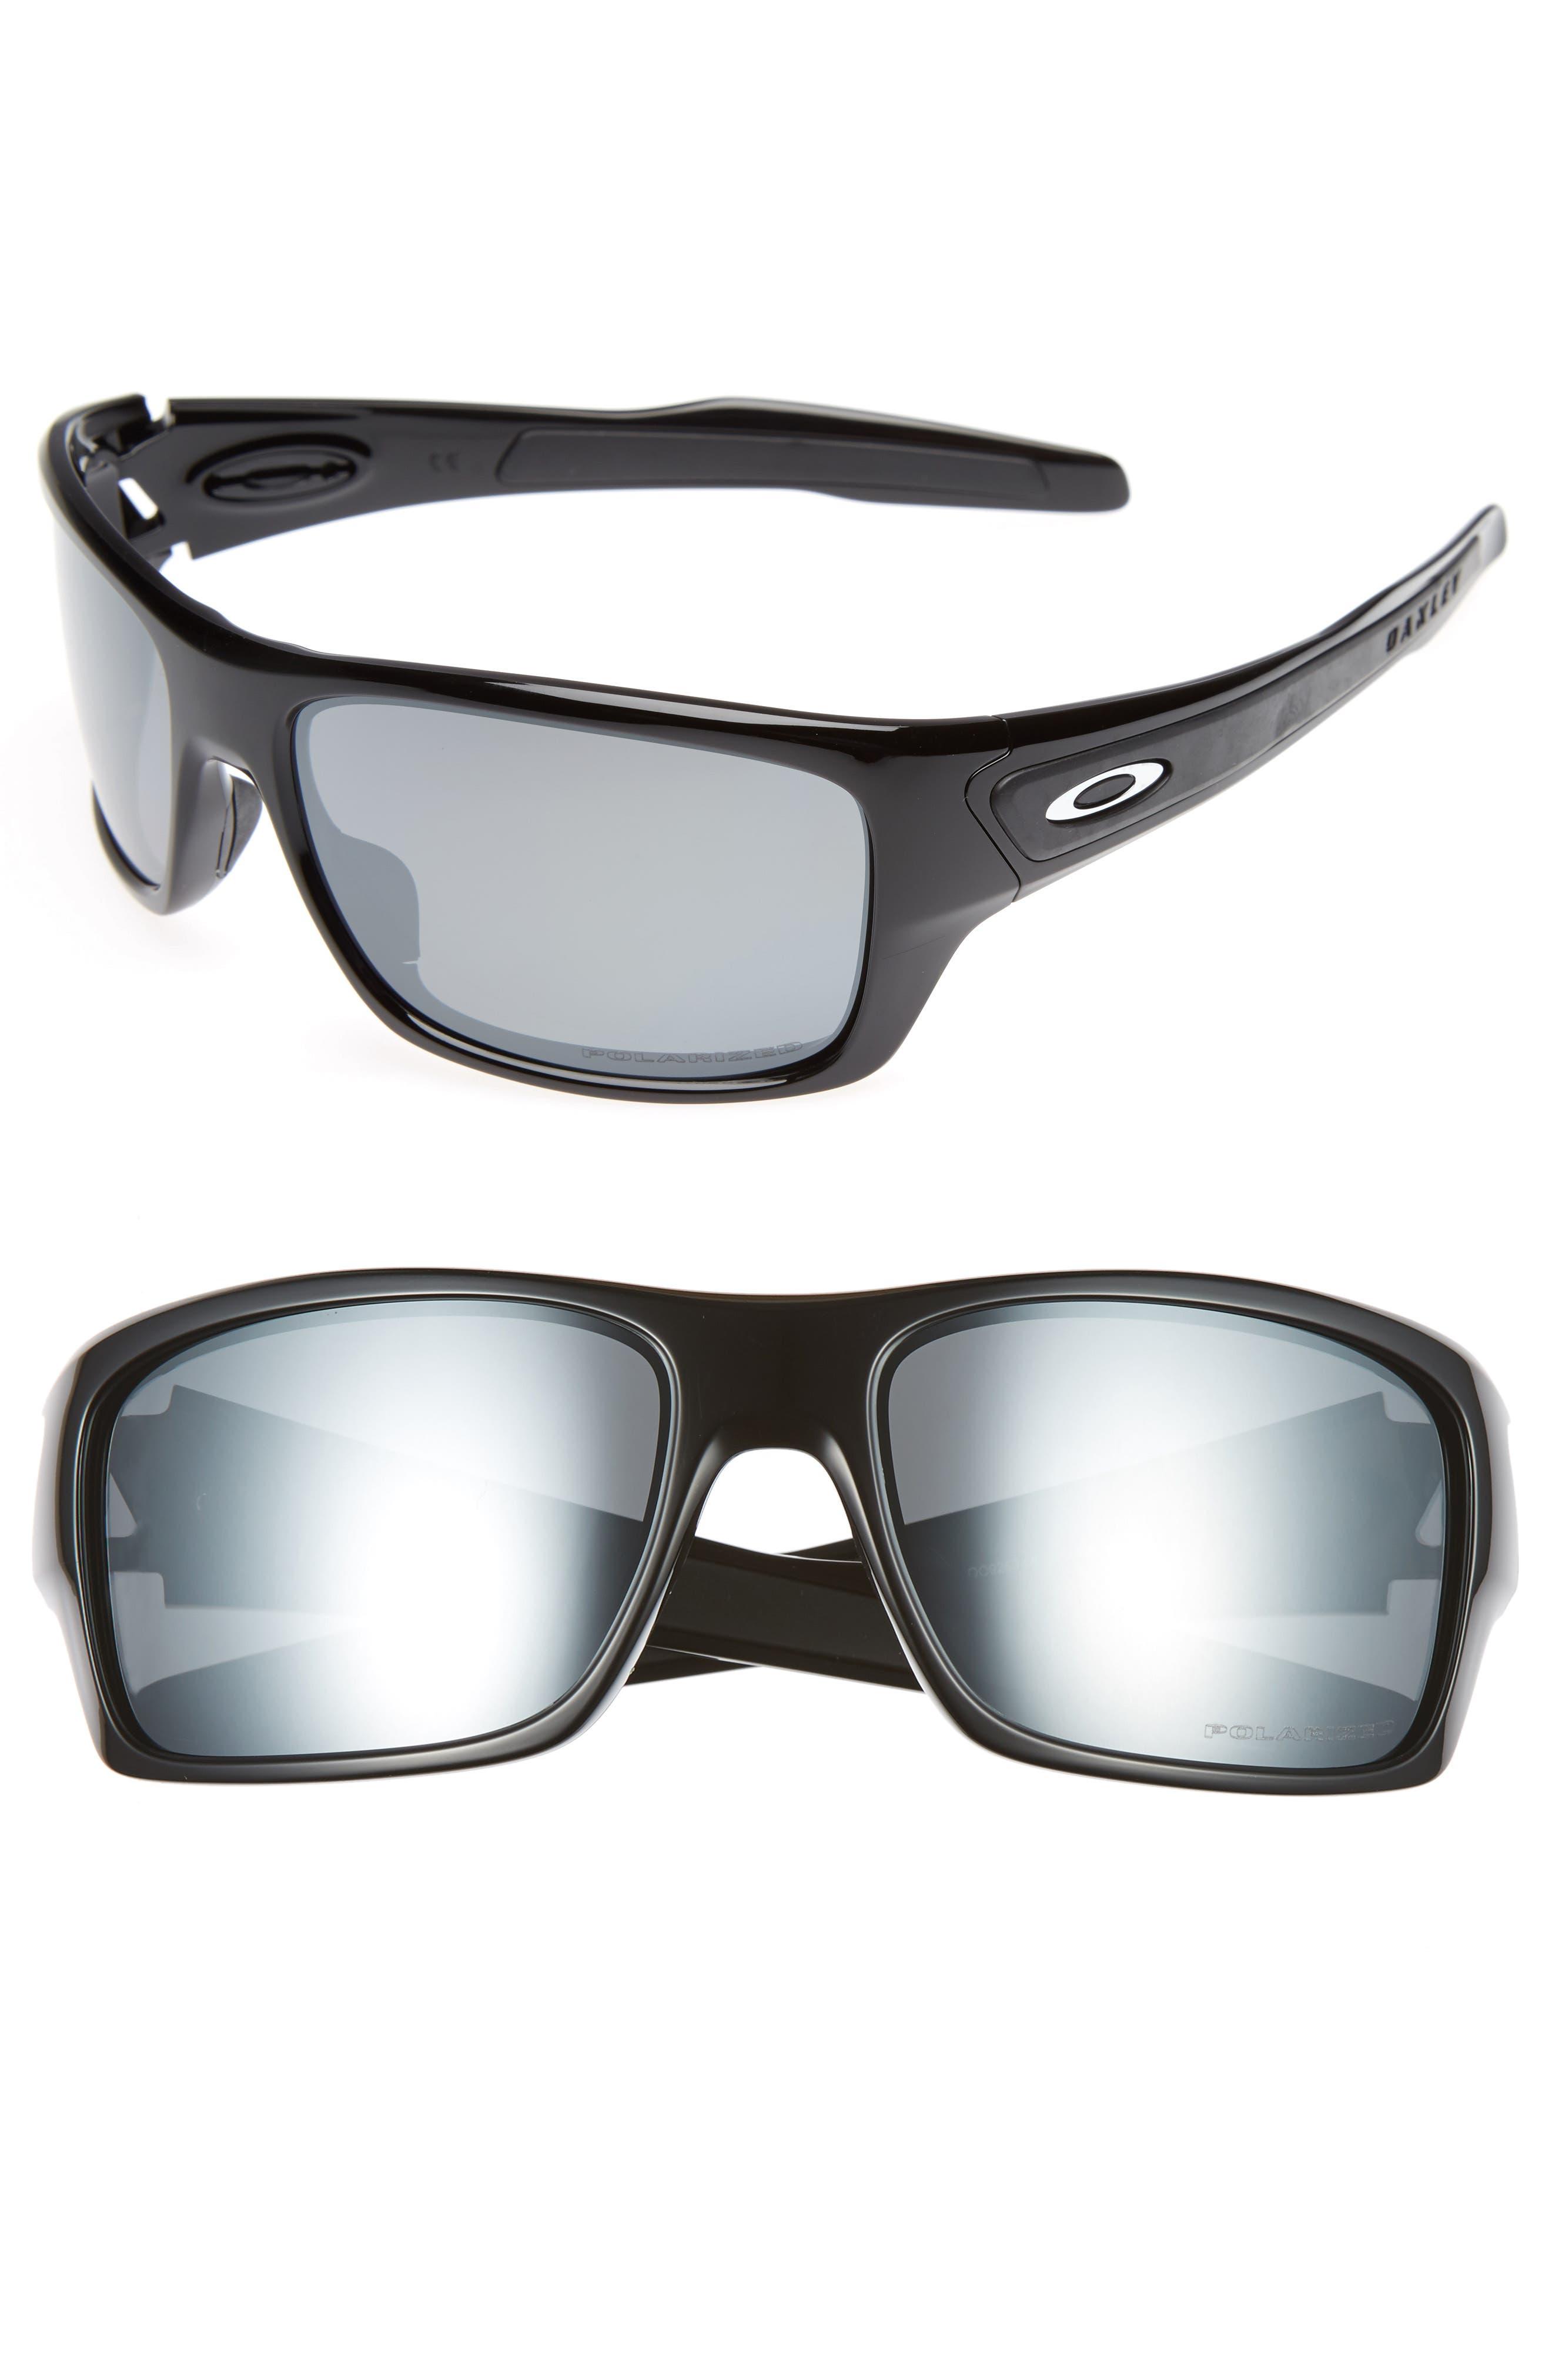 Oakley Turbine 65Mm Polarized Sunglasses - Black